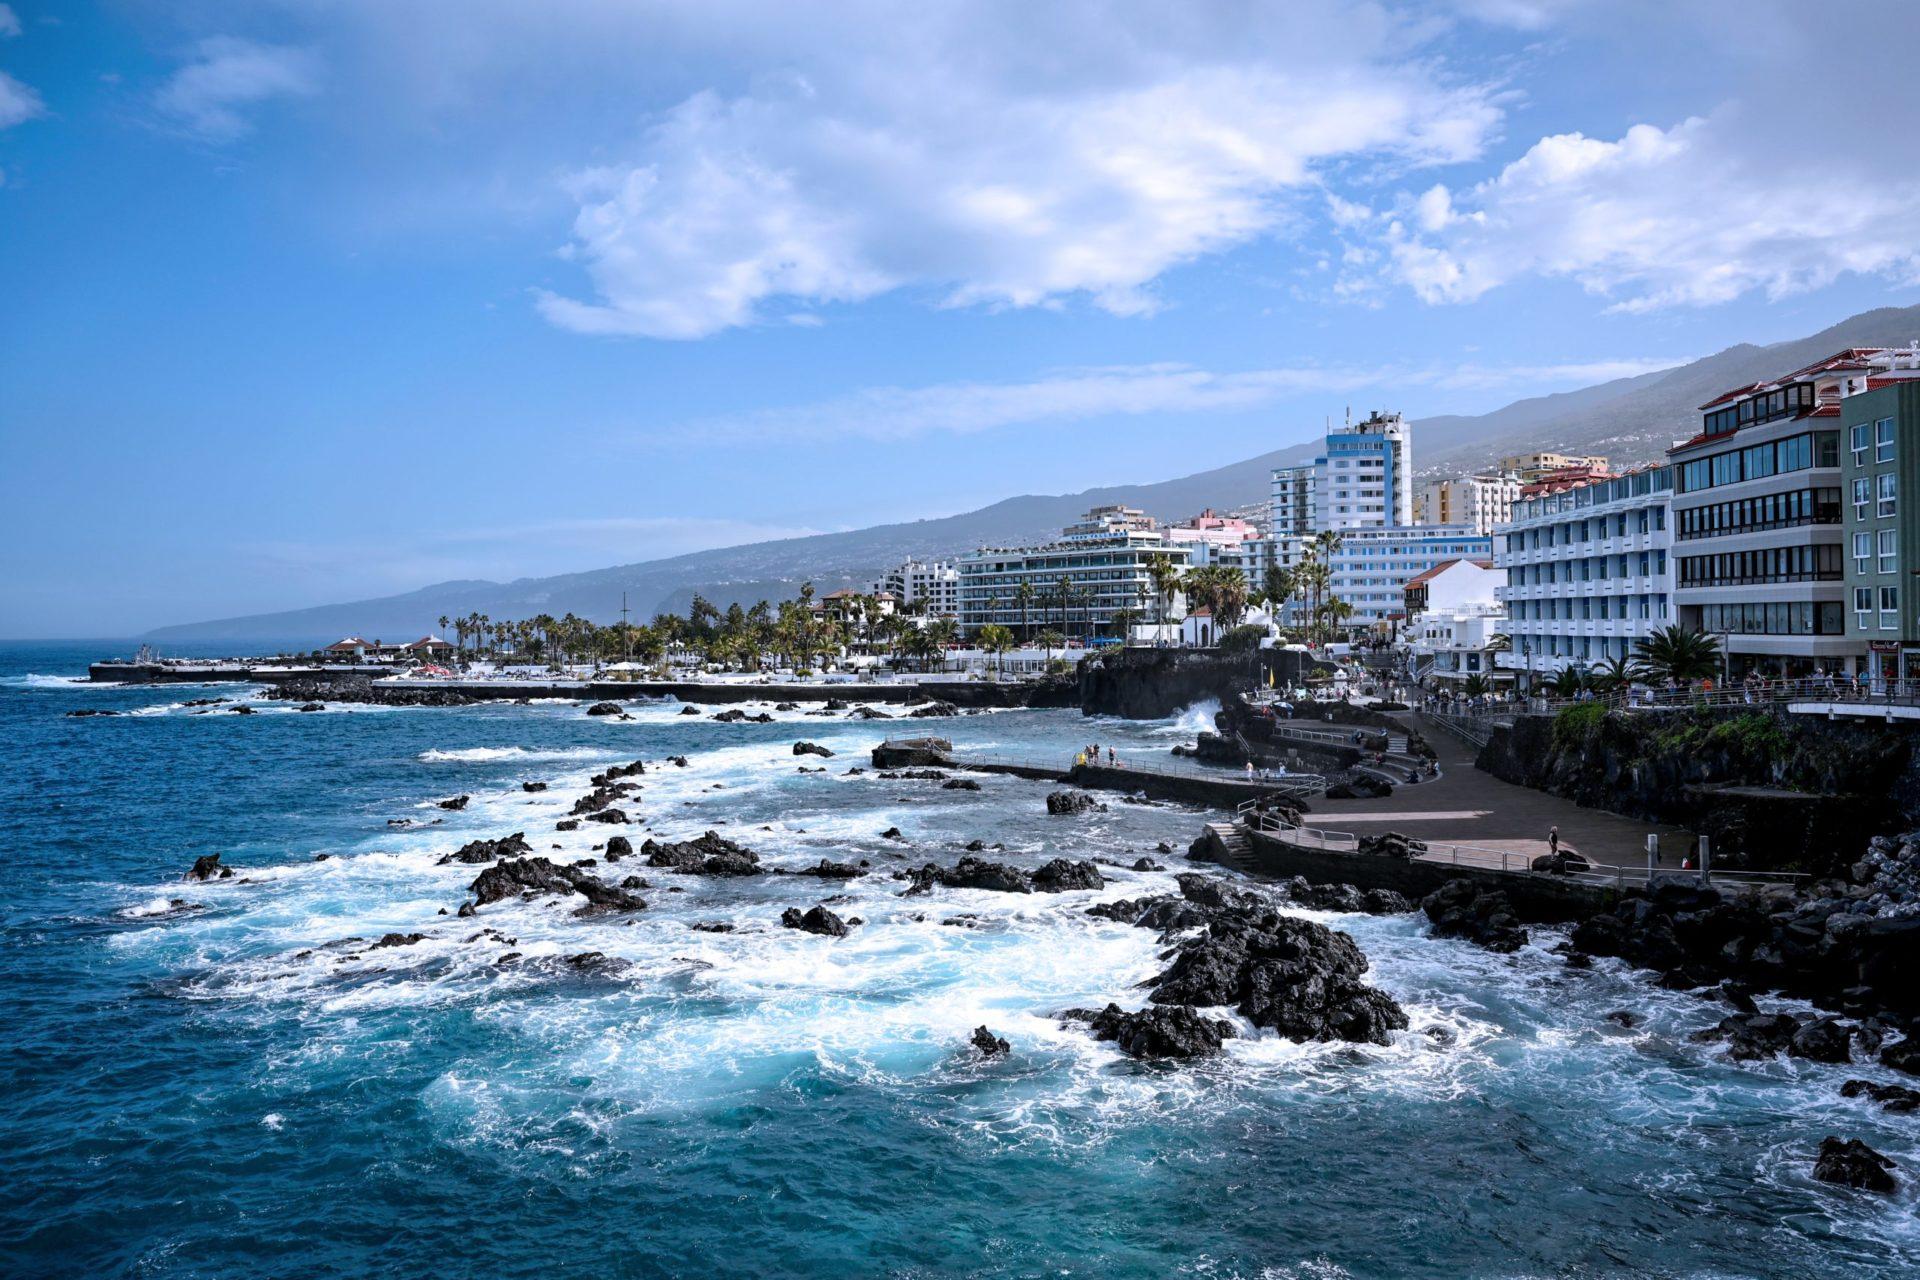 Wassertemperatur Teneriffa: Strandpromenade an der Küste vor Santa Cruz de Tenerife